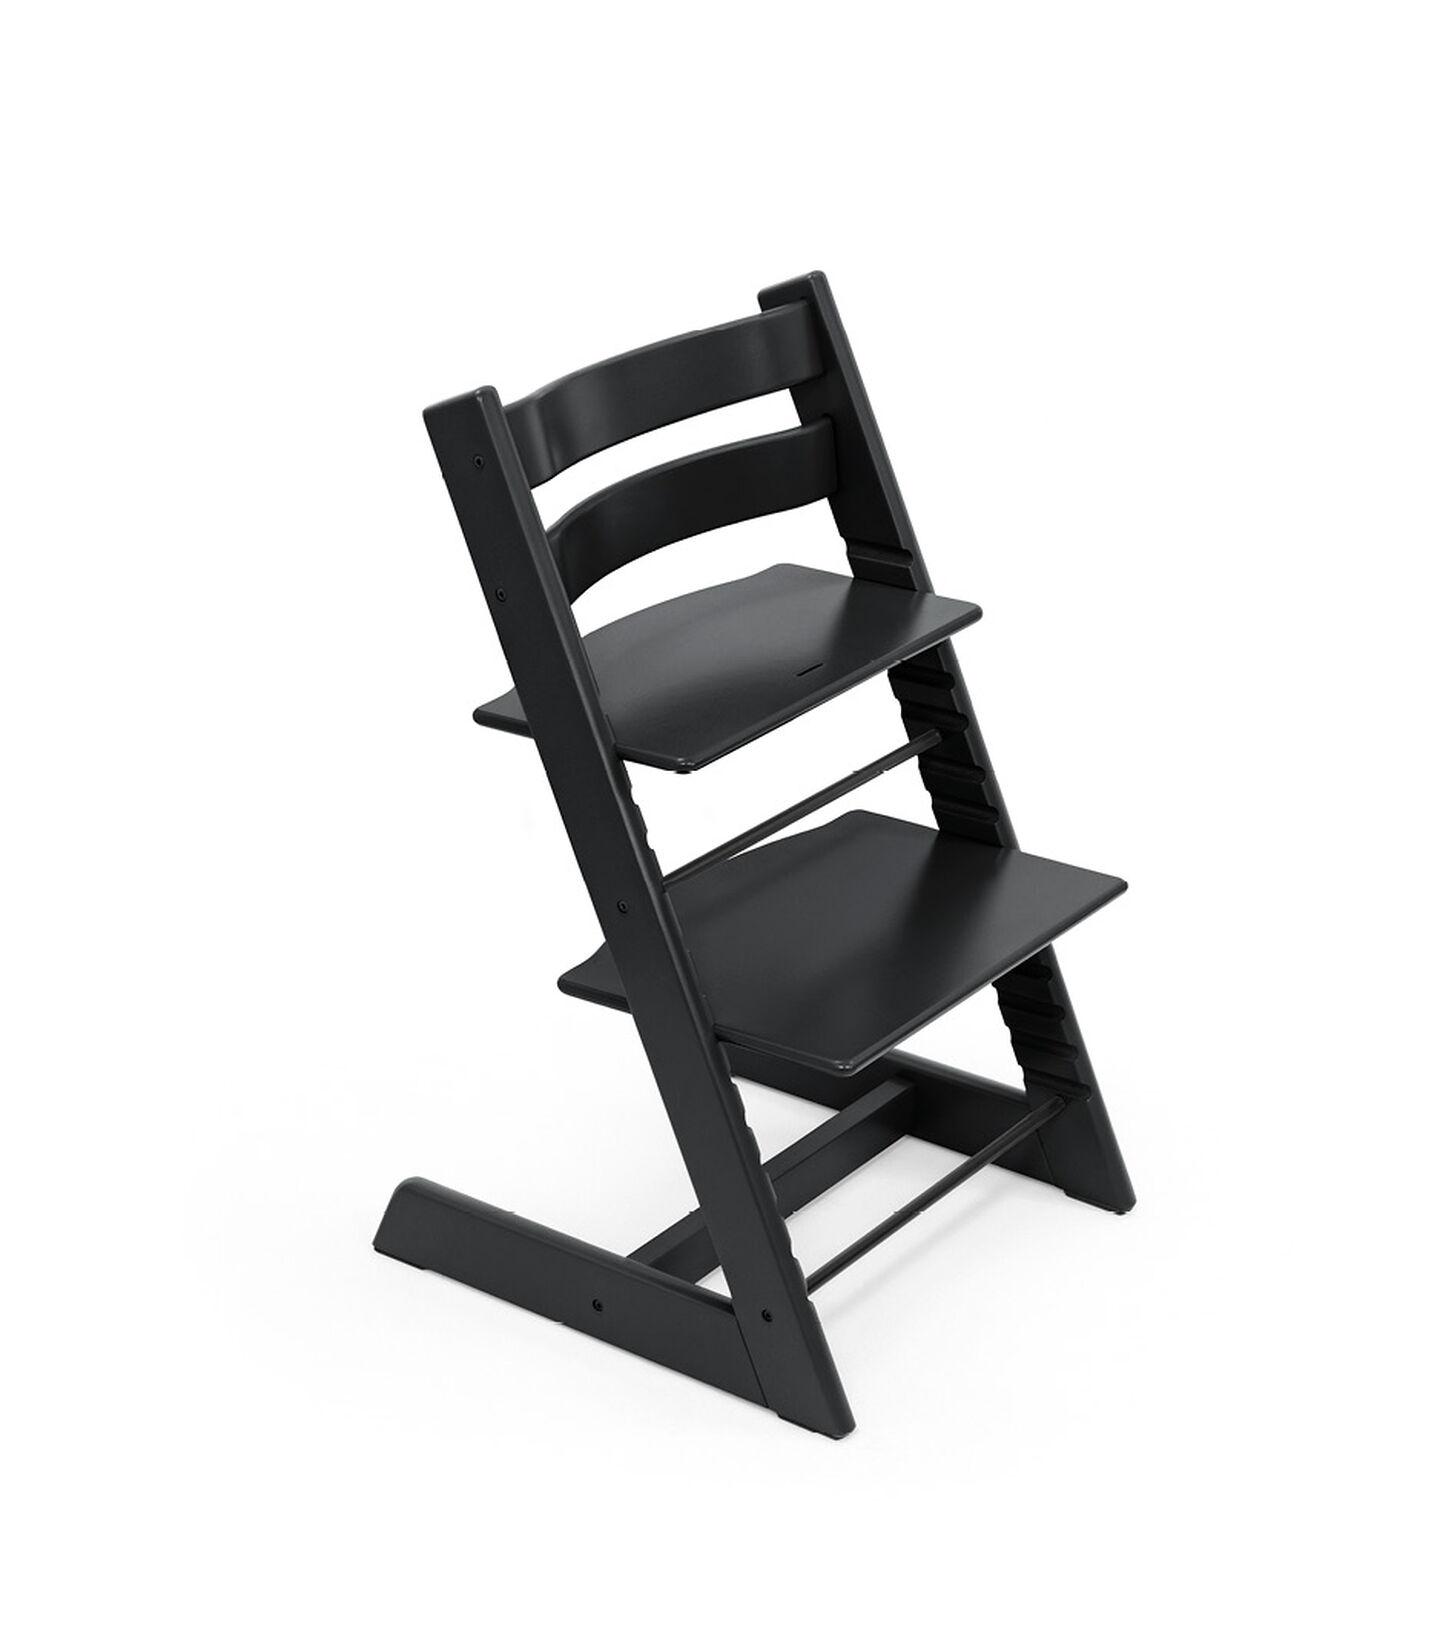 Tripp Trapp® Siyah Sandalye, Siyah, mainview view 1